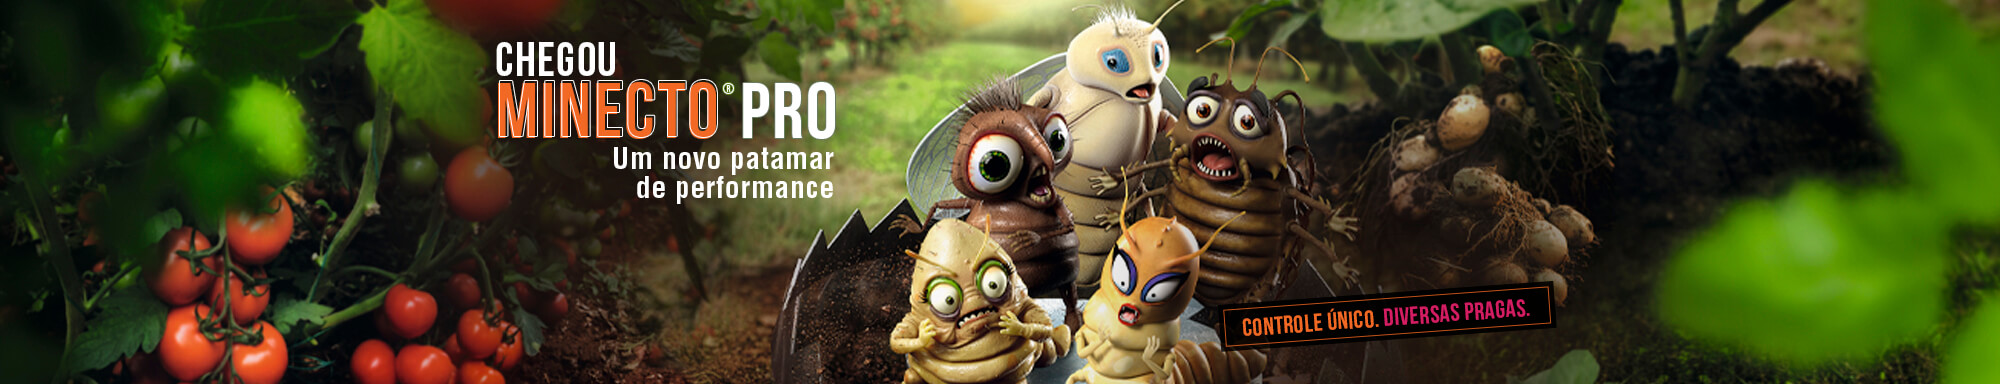 Minecto Pro é inseticida para controle de diversas pragas